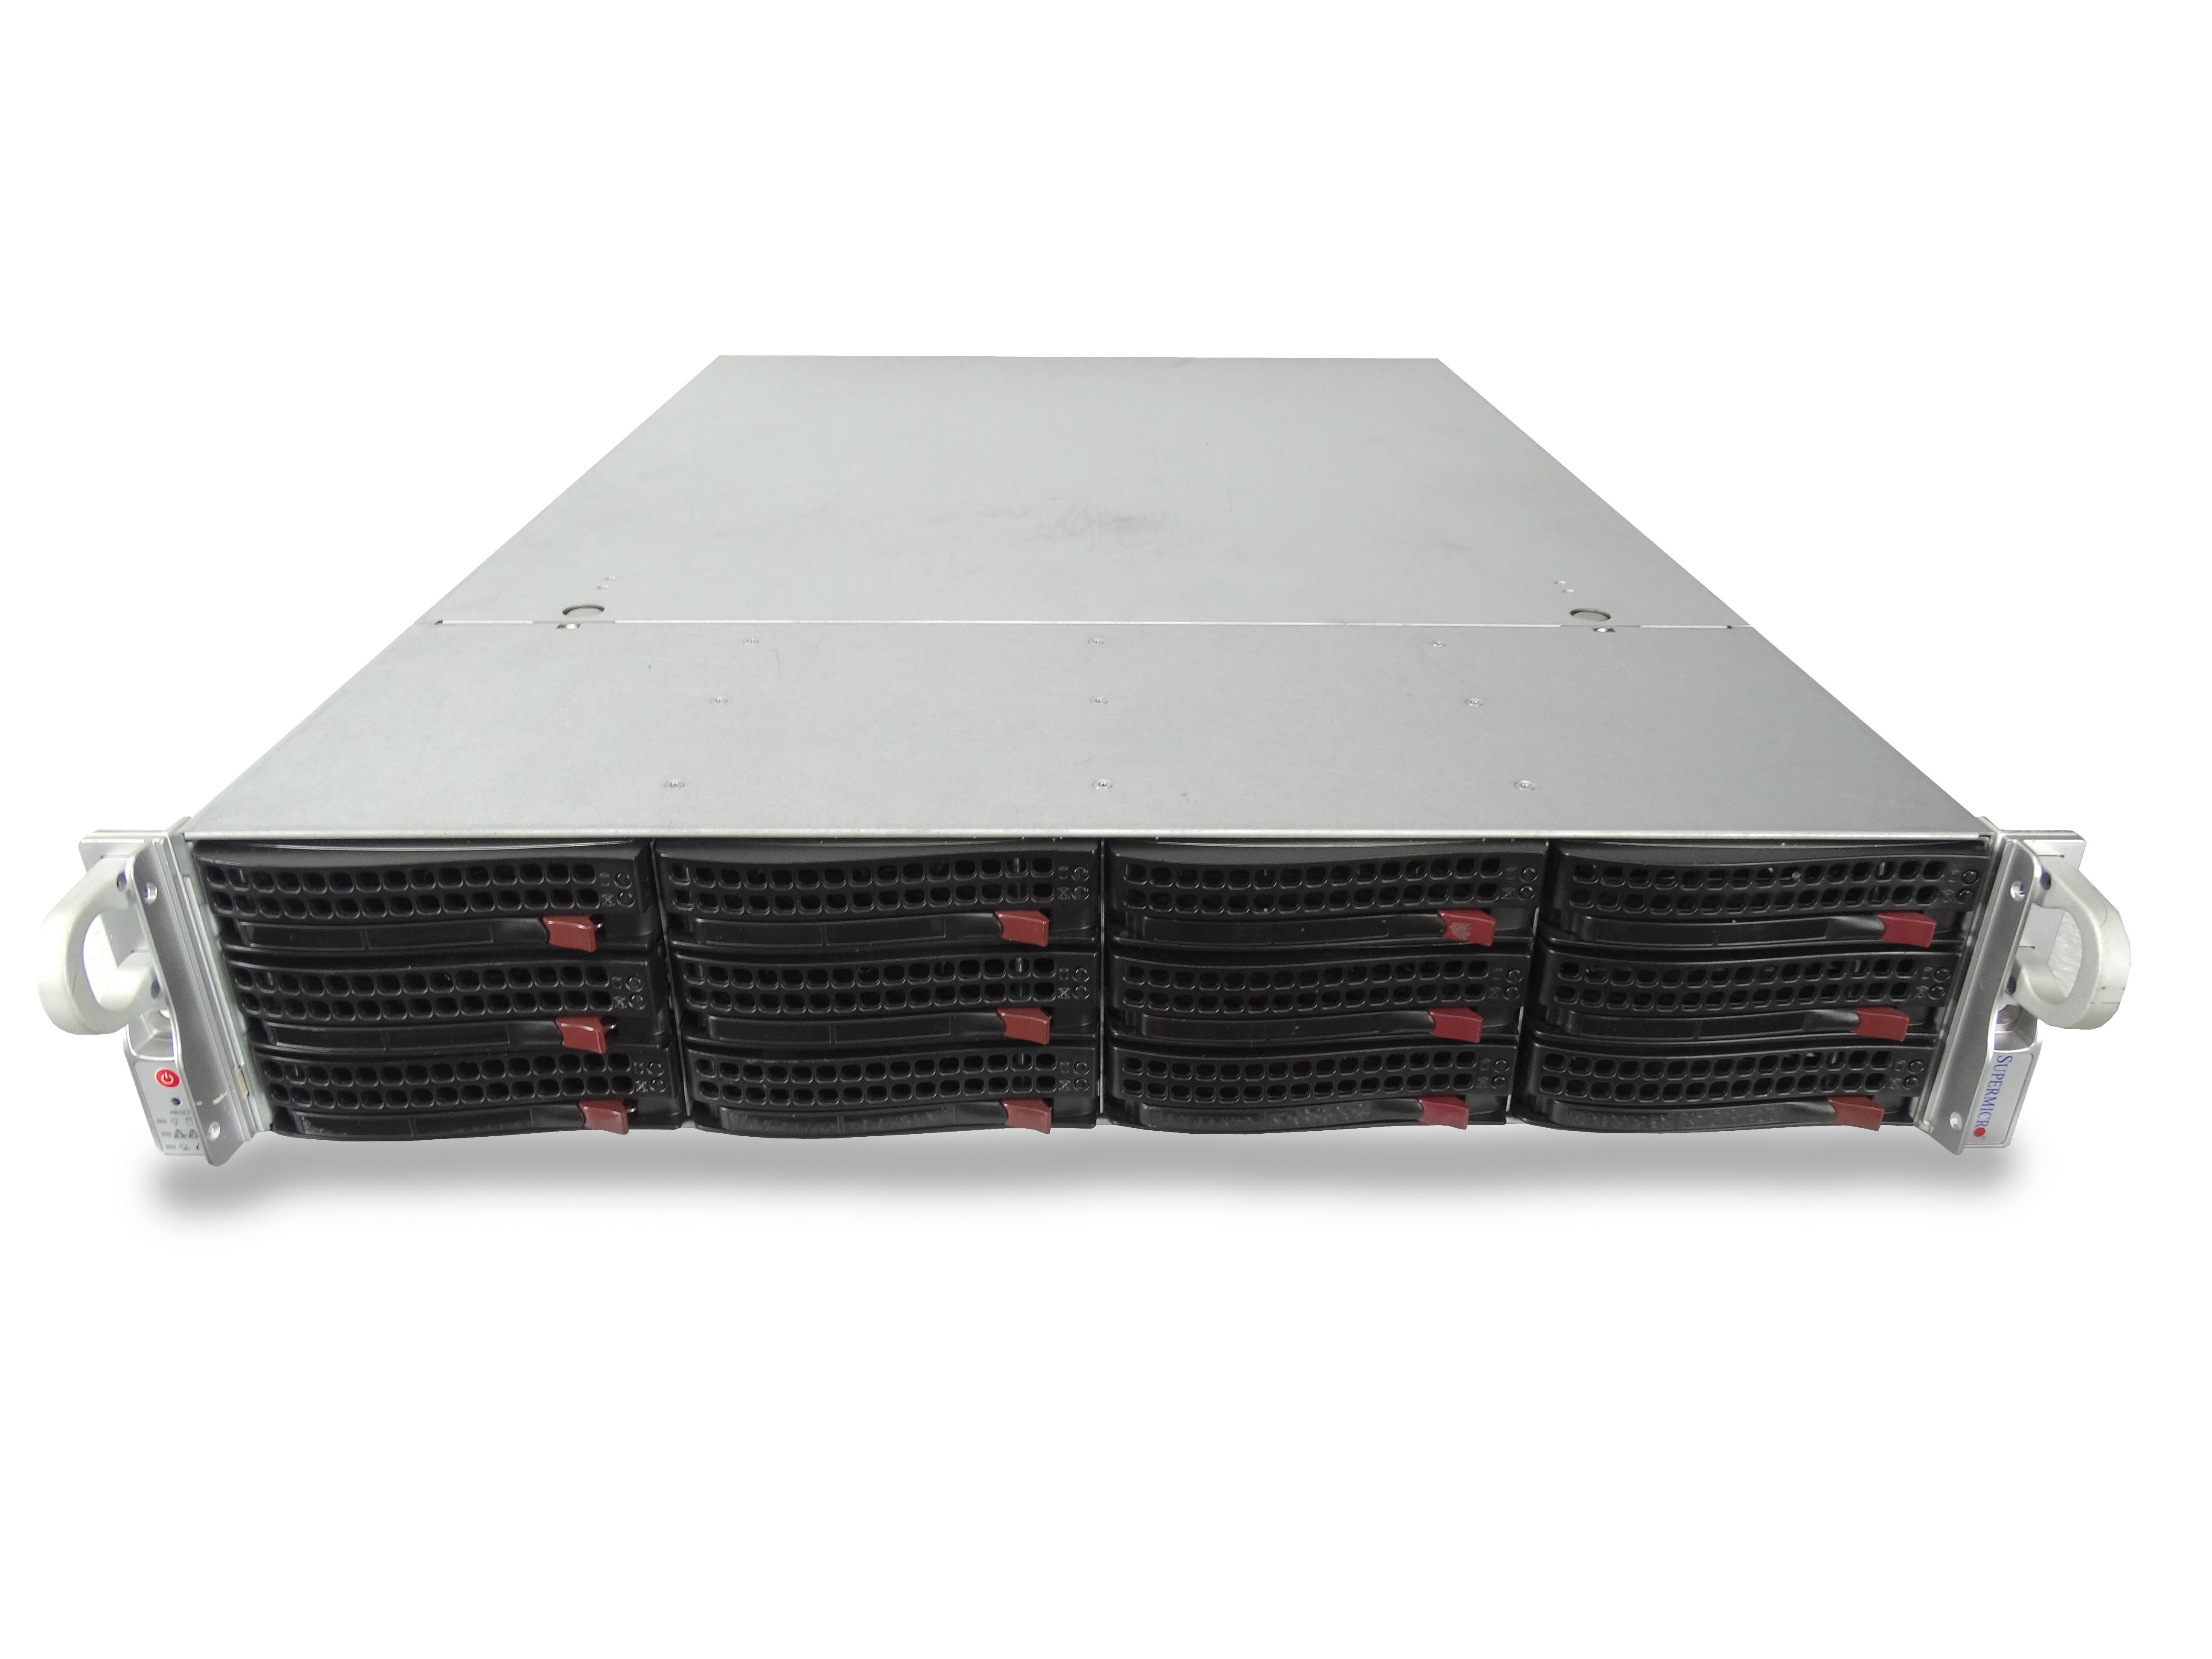 Supermicro SuperServer 6027R 12-Bay LFF 2U Server with X9DRi-LN4F+ Motherboard